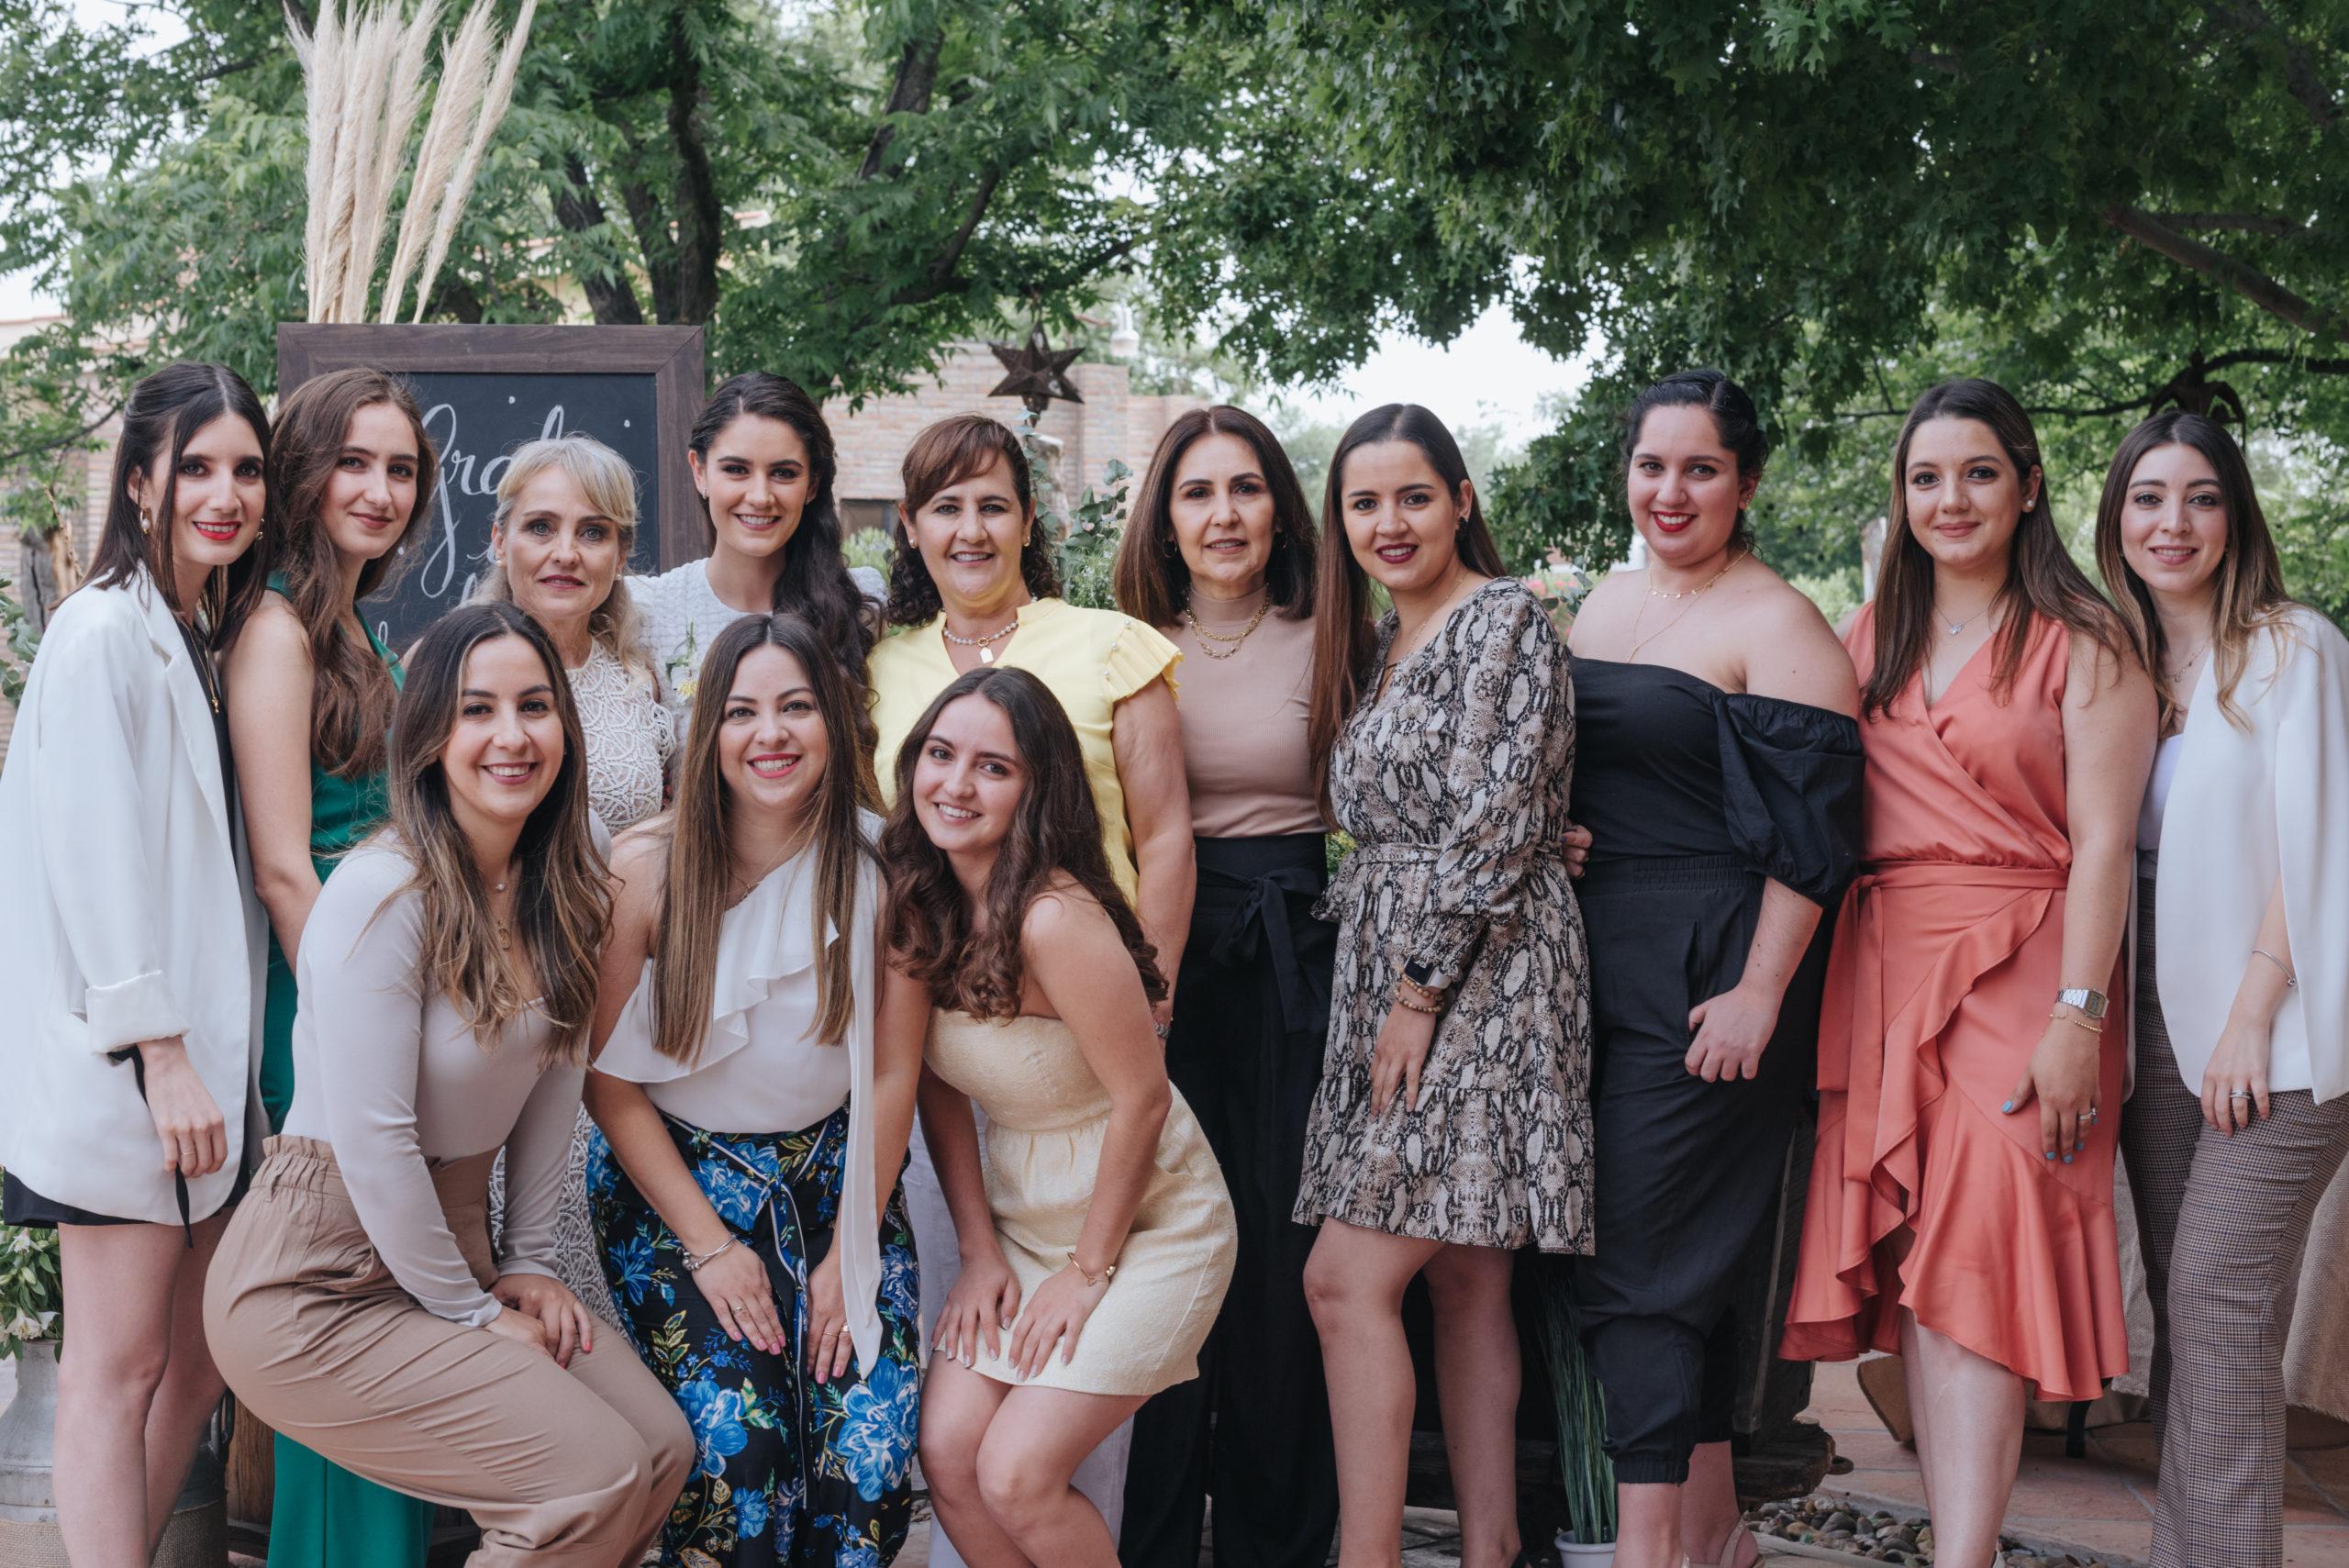 Roci y Ana Laura Dávila, Ana Laura Treviño, la festejada, Maru Dávila, Lizi Pérez, Ana Sofía, Lucero, Daniela, Maru, Maricarmen y Andrea Dávila.